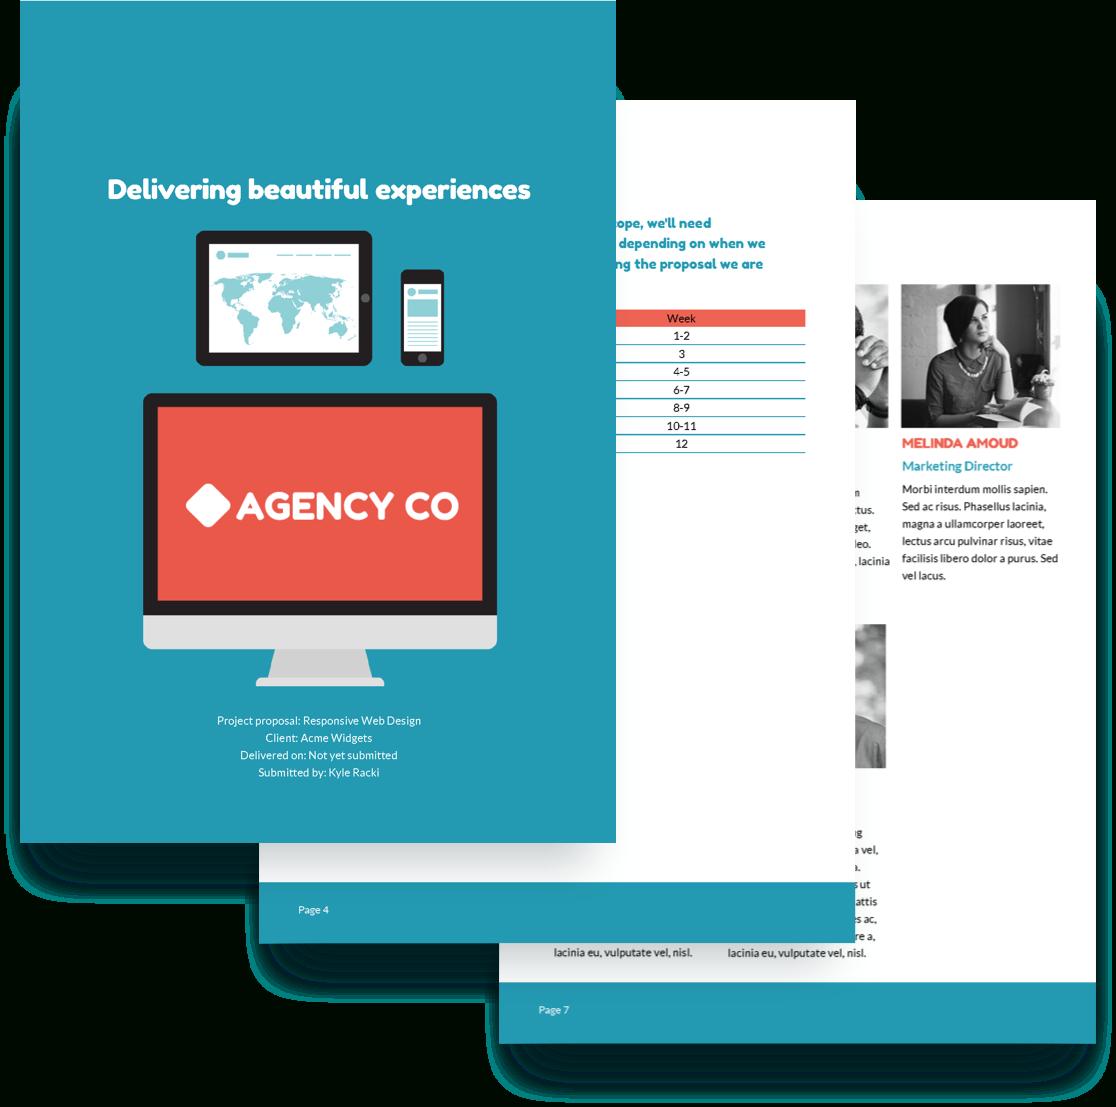 Web Design Proposal Template  Free Sample  Proposify Regarding Website Development Proposal Template